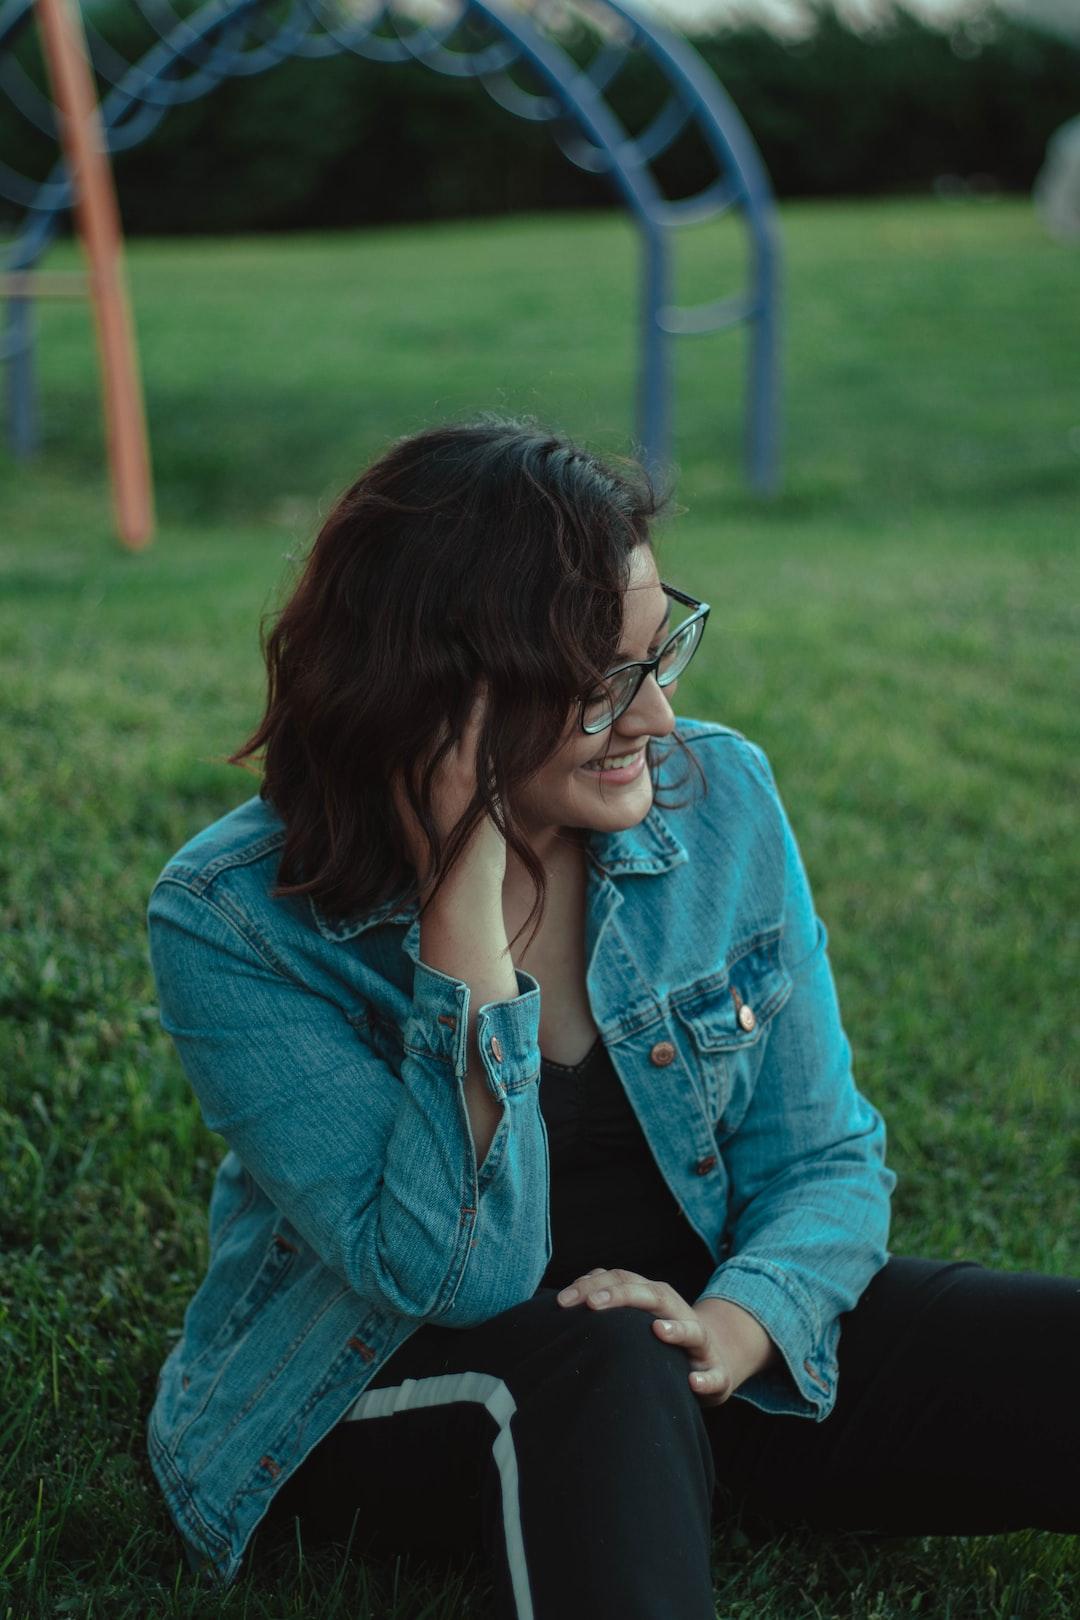 girl smiling at a park